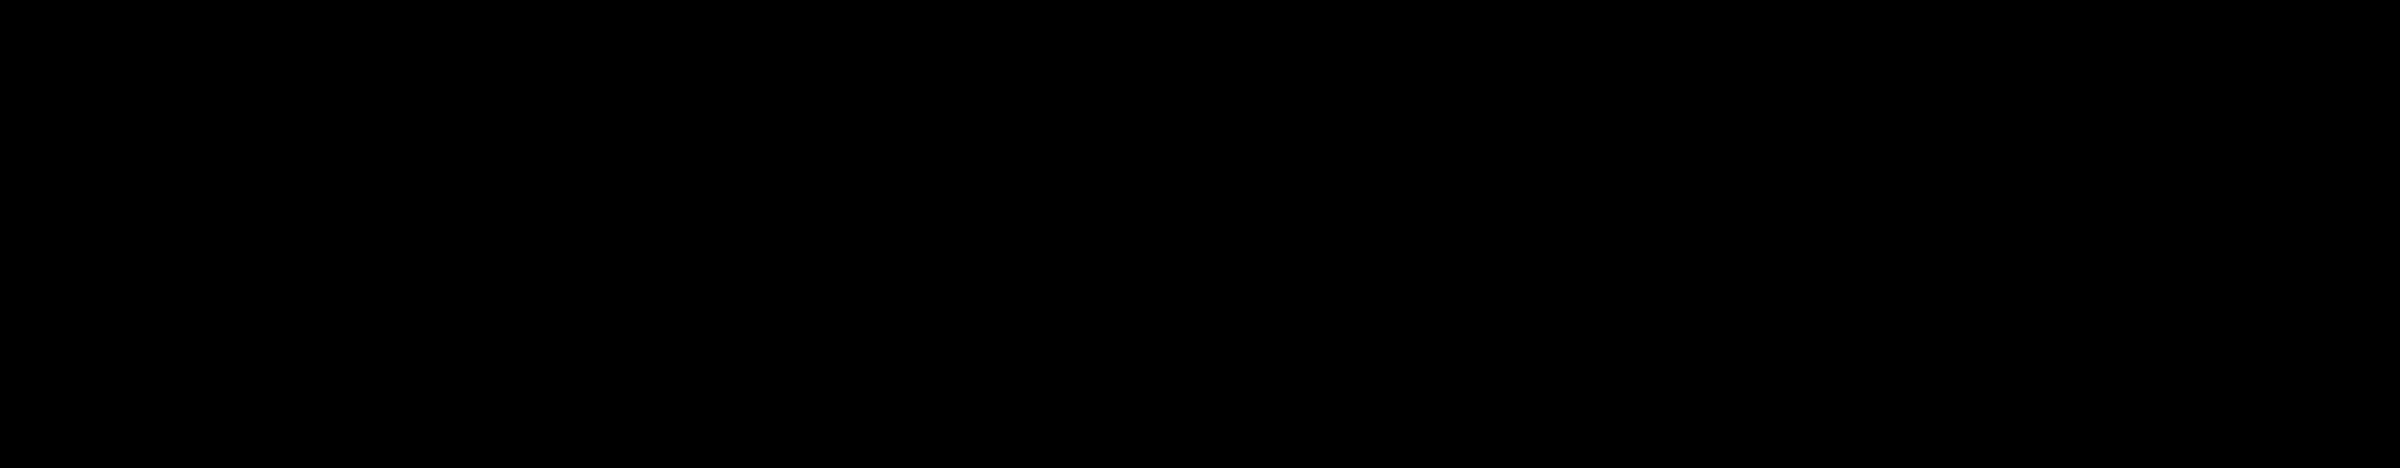 Bandai Logo PNG Transparent & SVG Vector.